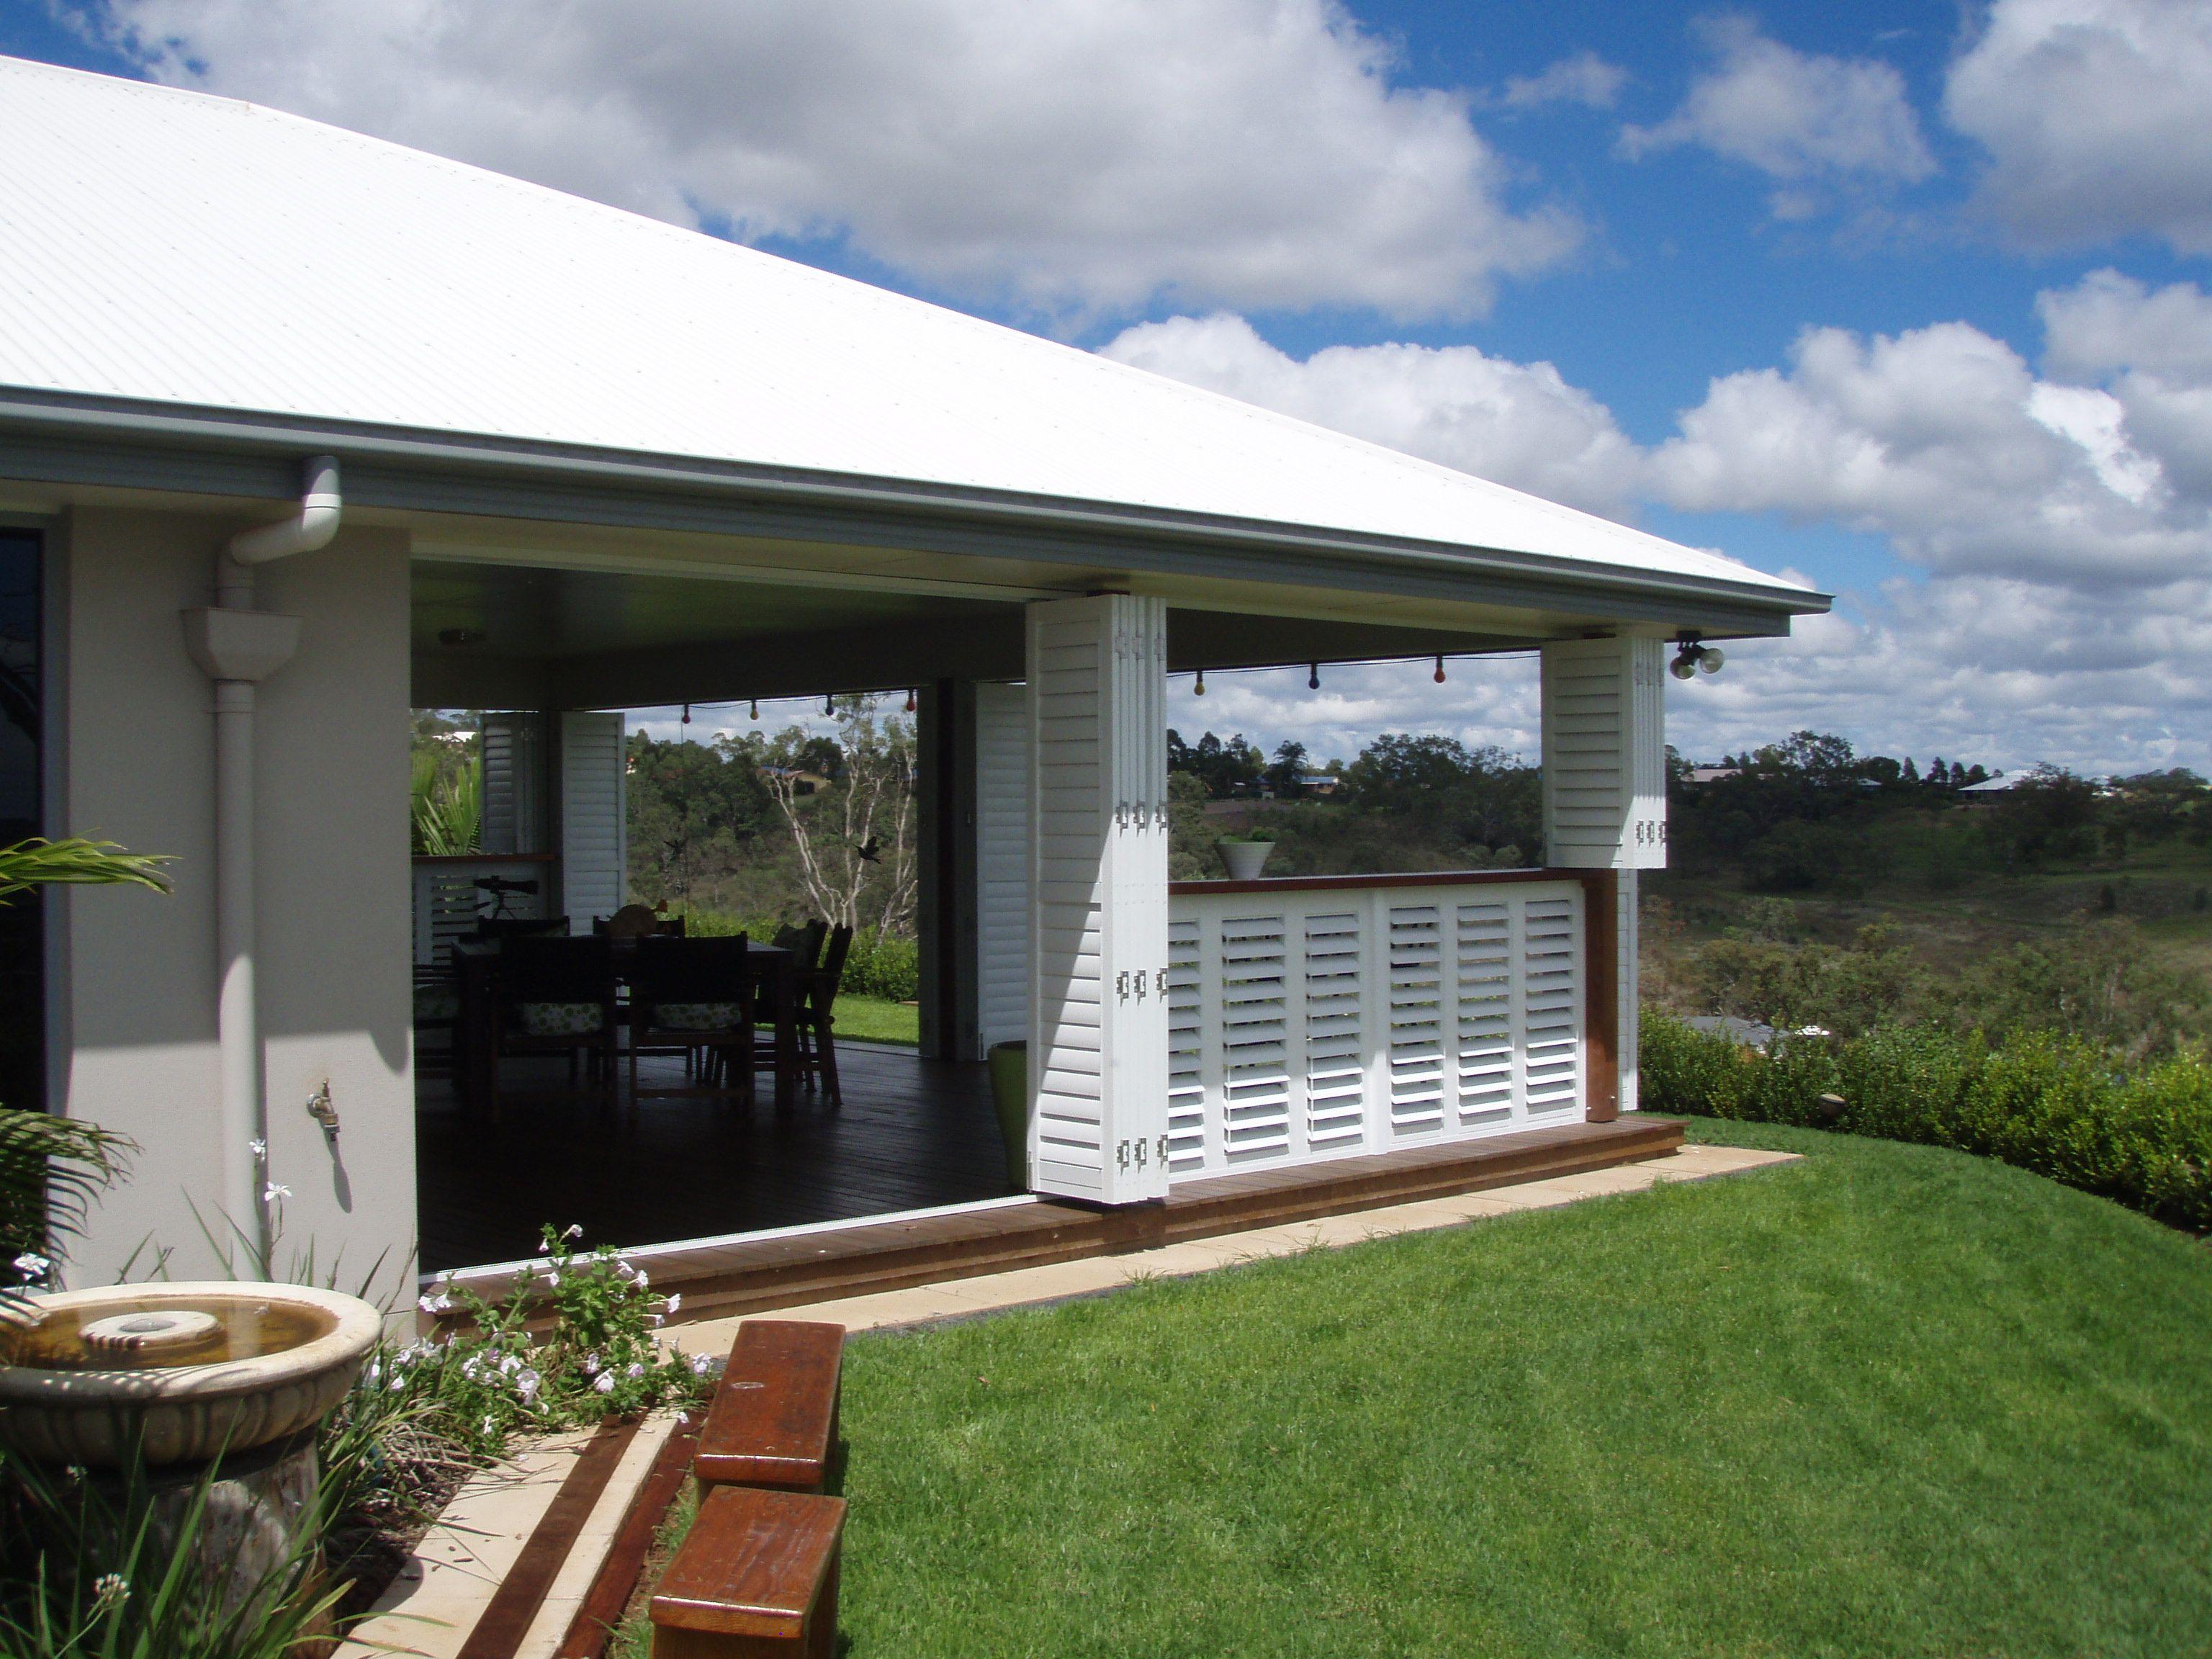 Charming Outdoor Living   Enclosed Deck, Patio Or Porch Contemporary Porch